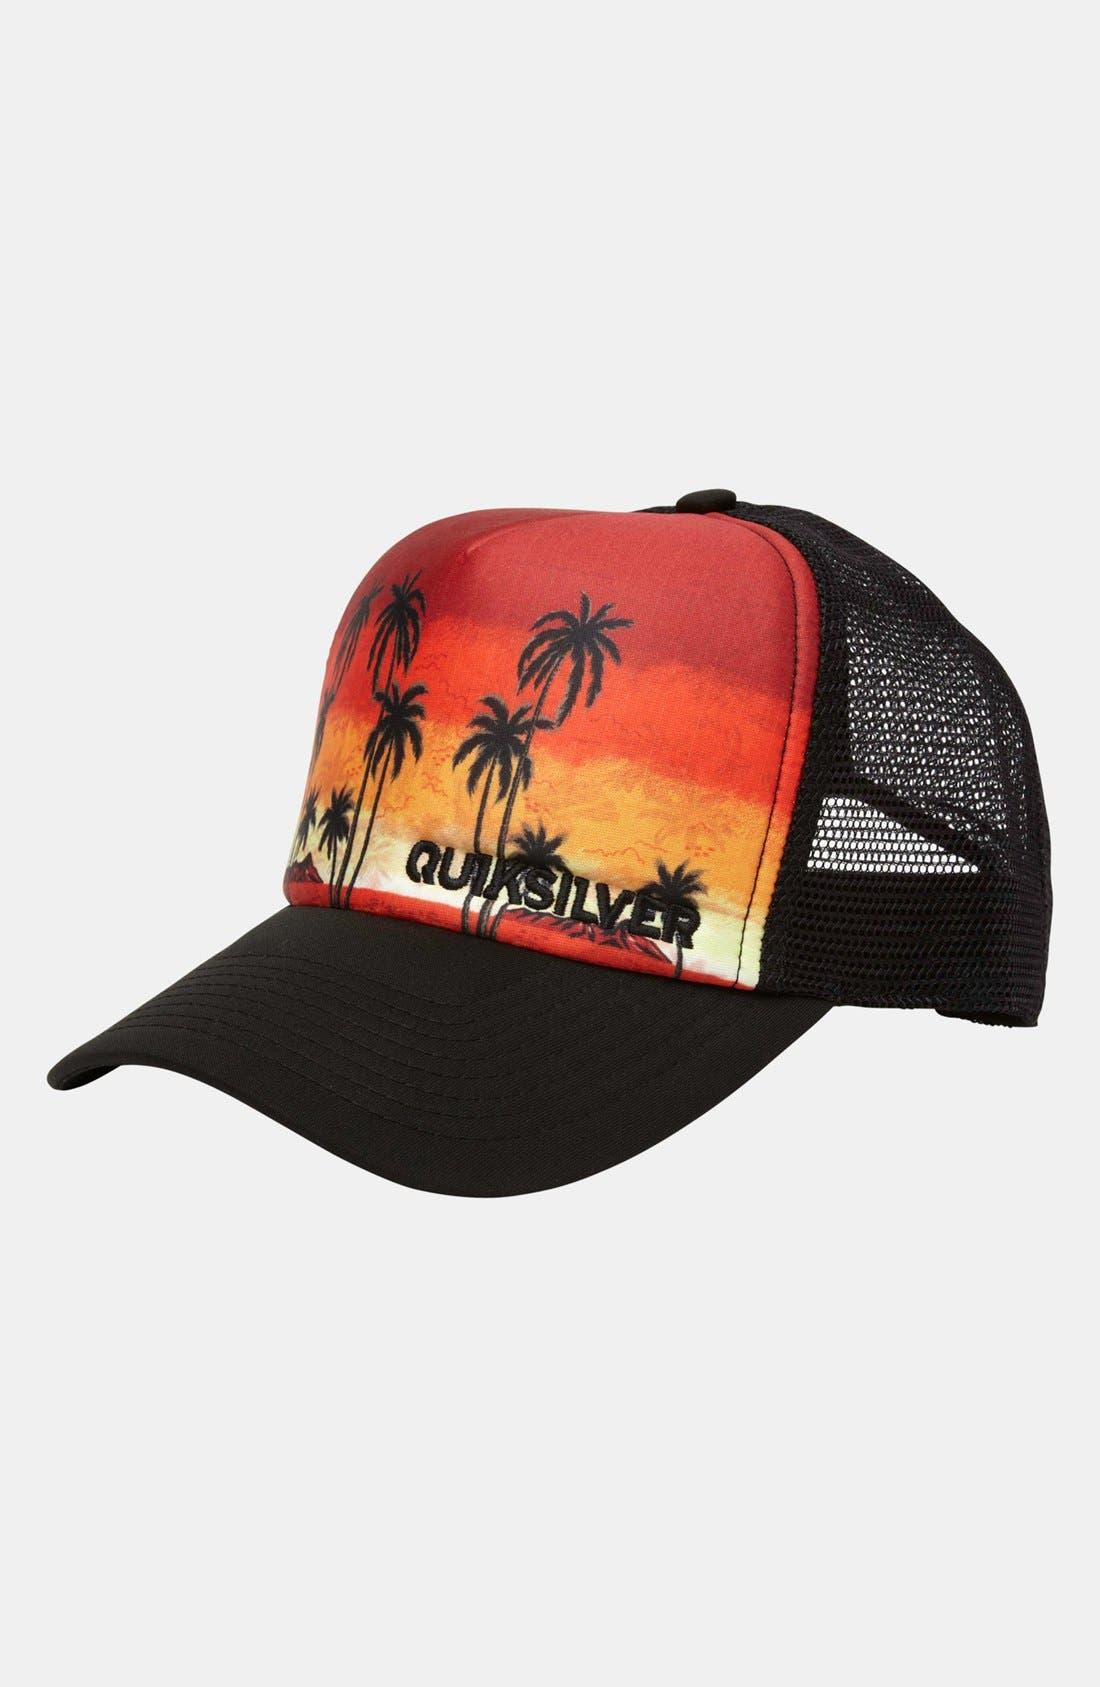 Alternate Image 1 Selected - Quiksilver 'Boards B' Trucker Hat (Boys)